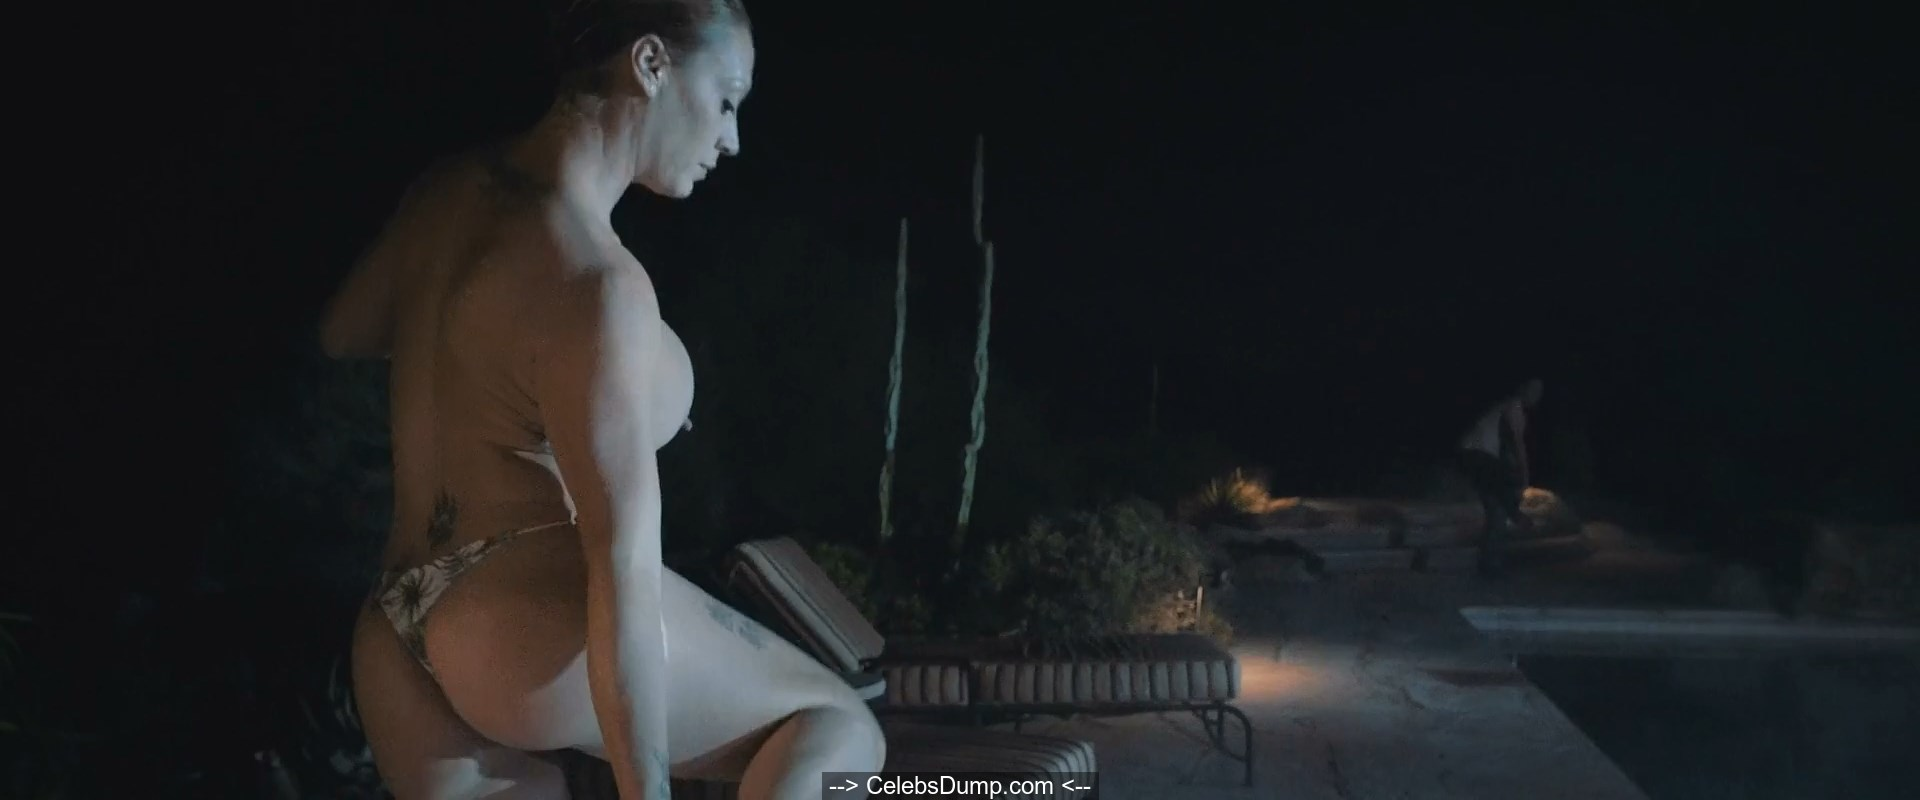 Audrey mitchell nude